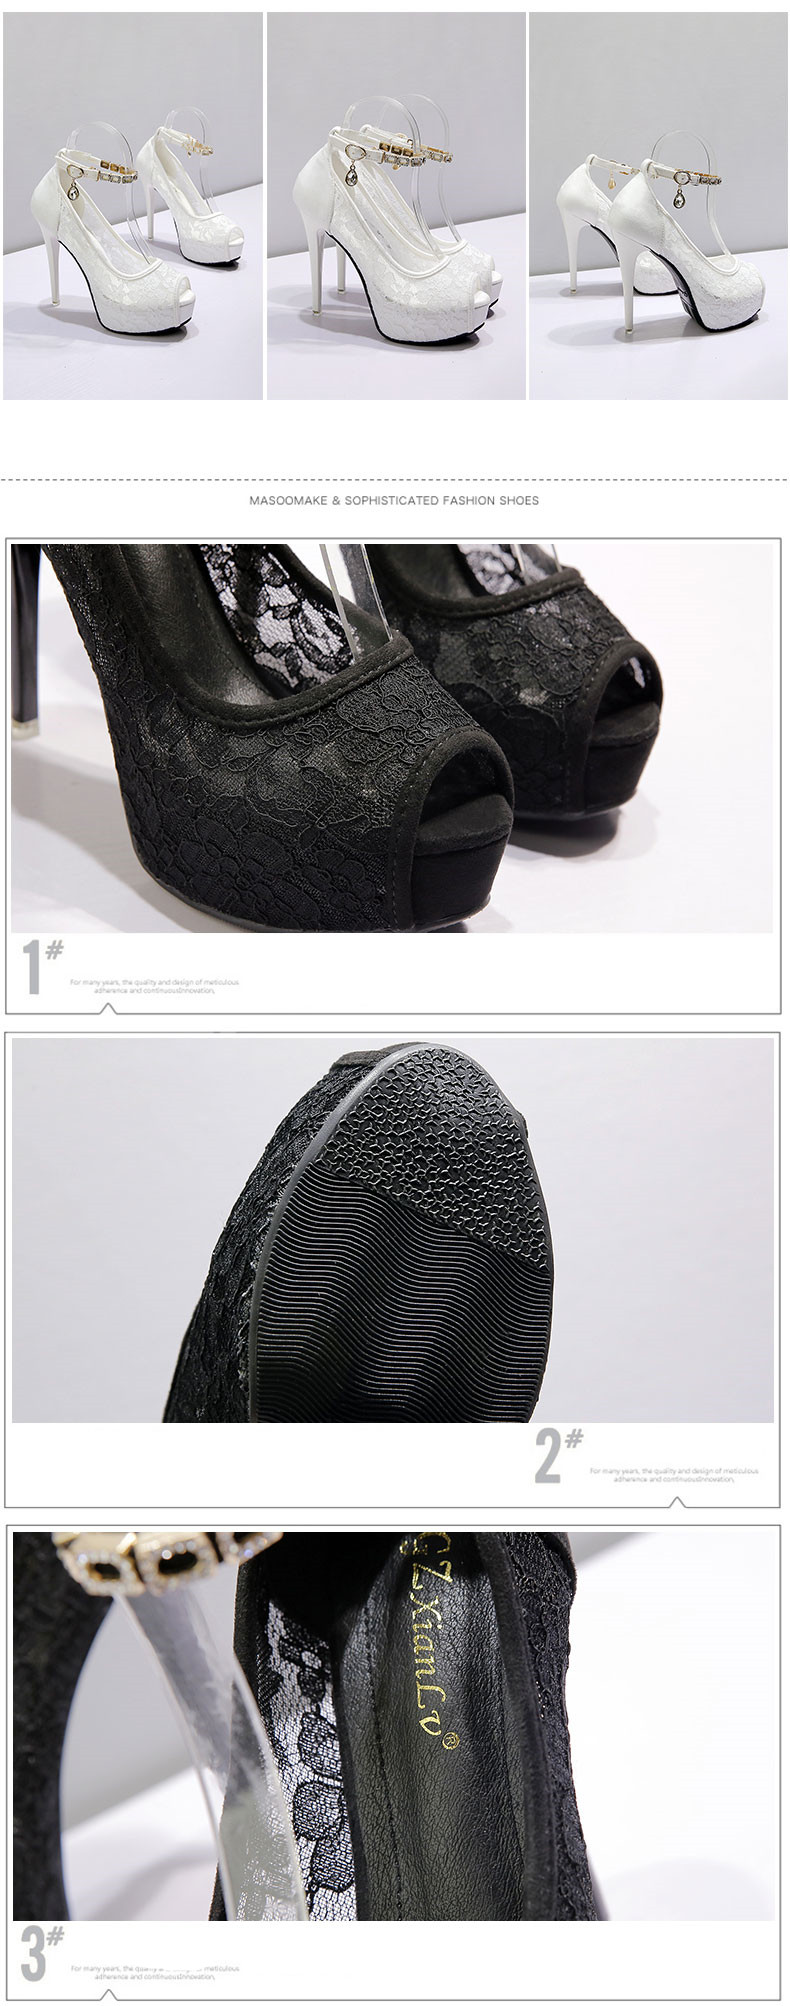 RUIDENG women super high heel wedding pumps 12cm peep toe sweet sexy party shoes lady lace platform 4cm thin heels 4